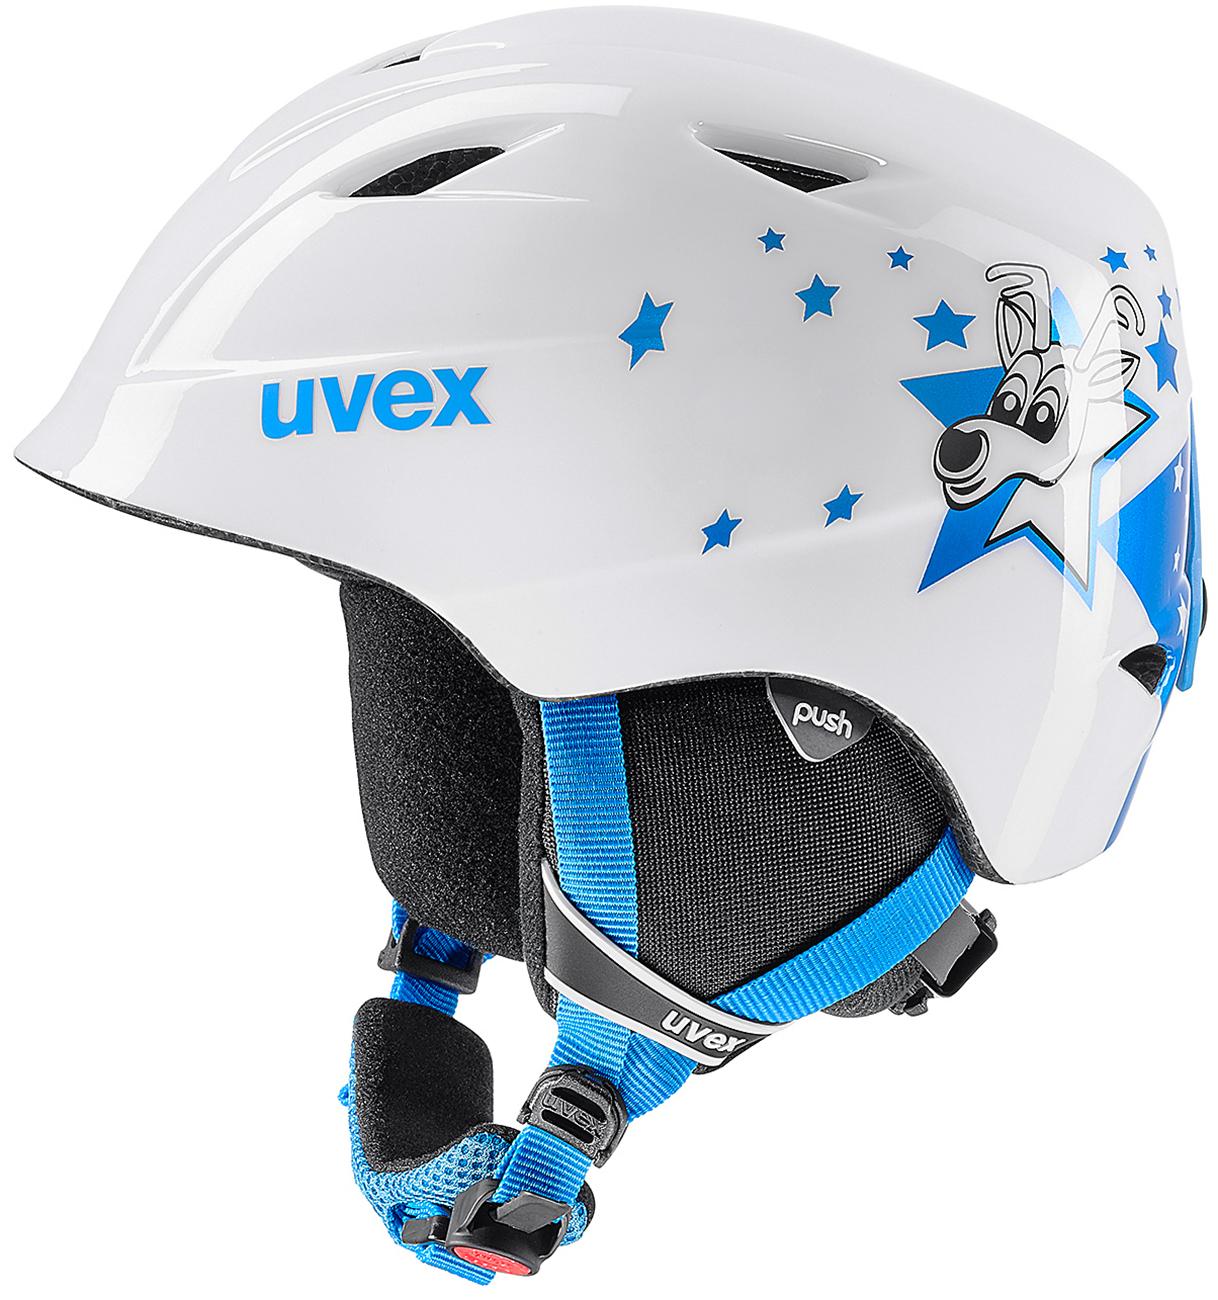 Uvex Шлем детский Uvex Airwing 2 uvex маски горнолыжные